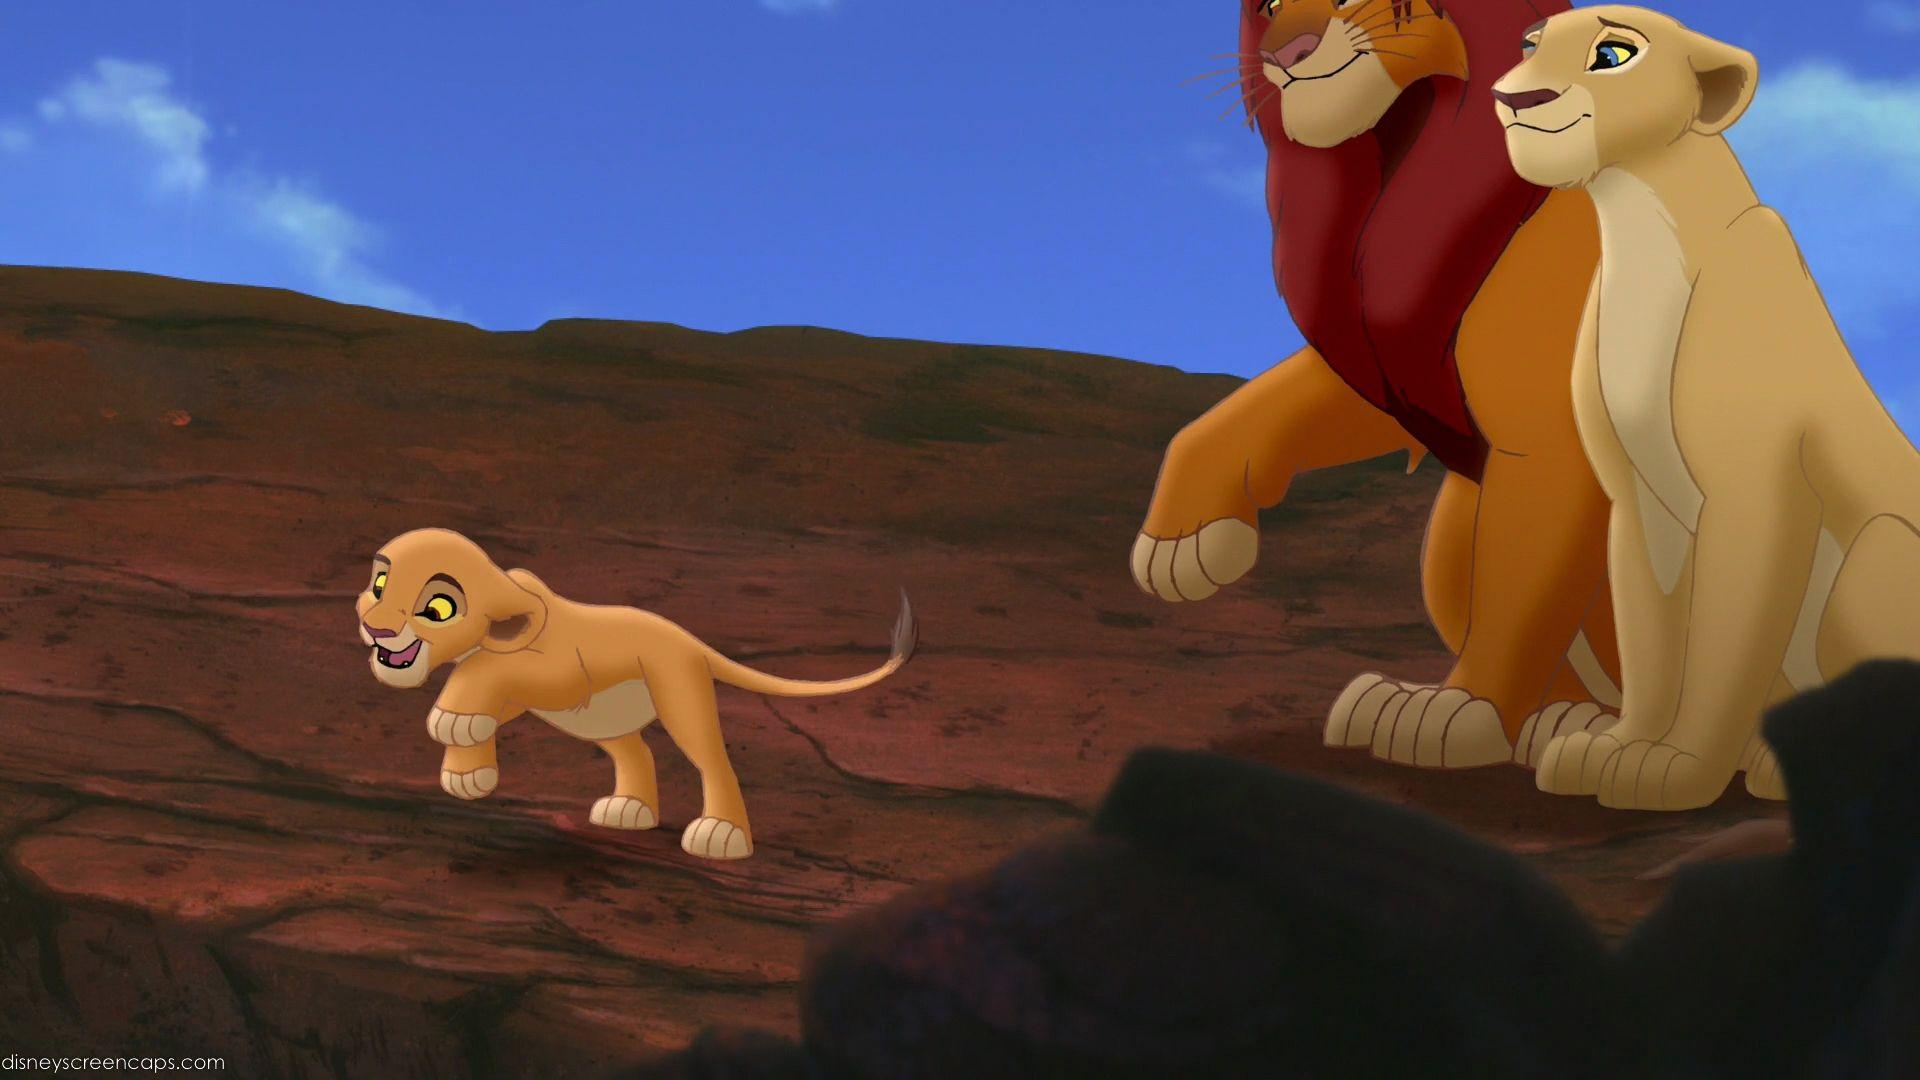 The Lion King Simba And Kiara Nude - Nude Gallery-3889